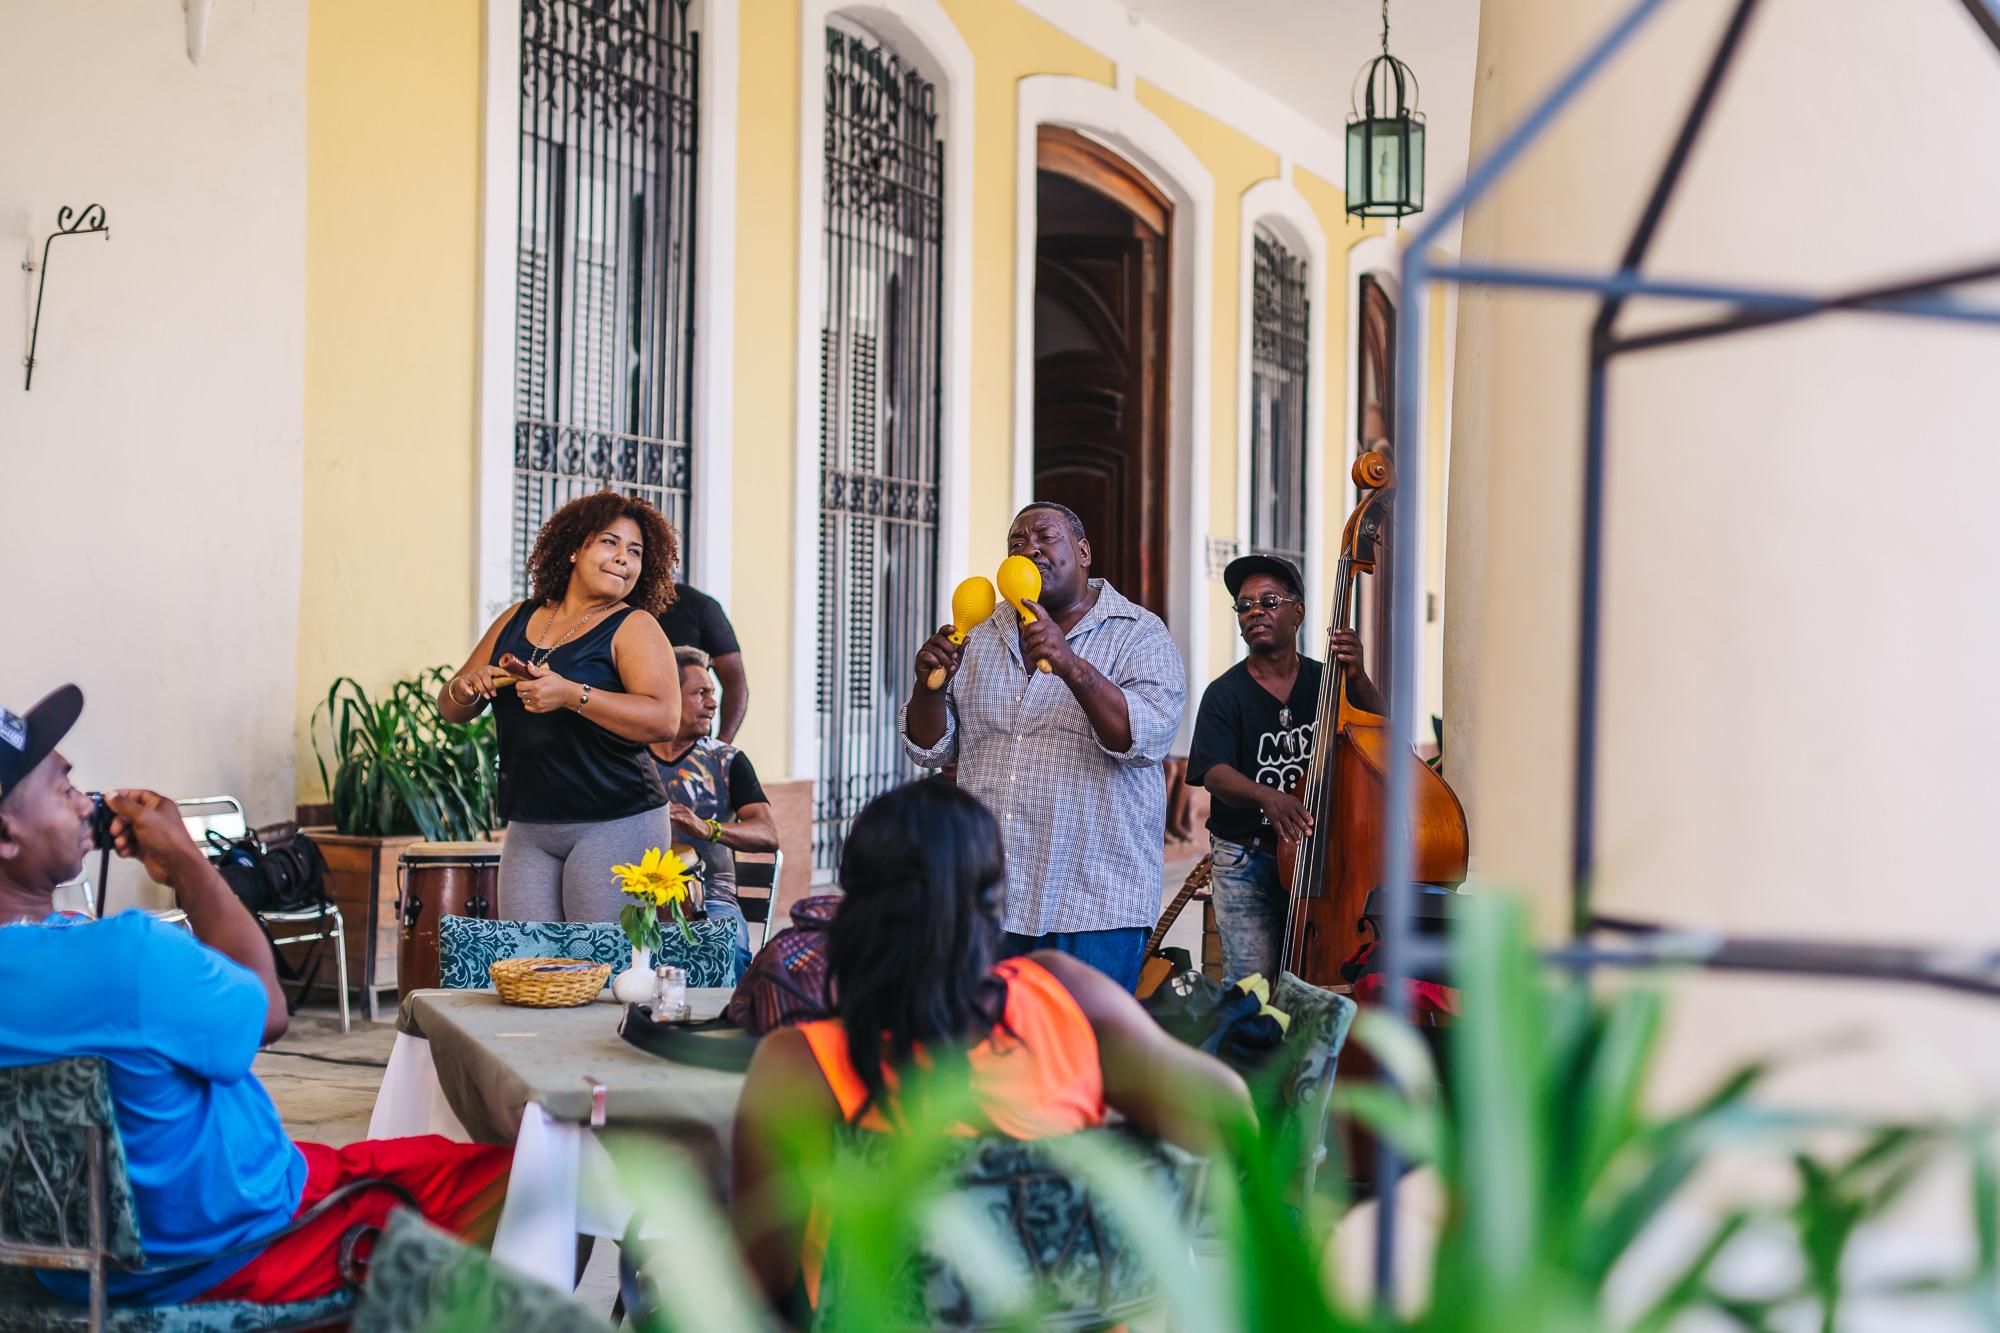 You hear music everywhere you go in Havana